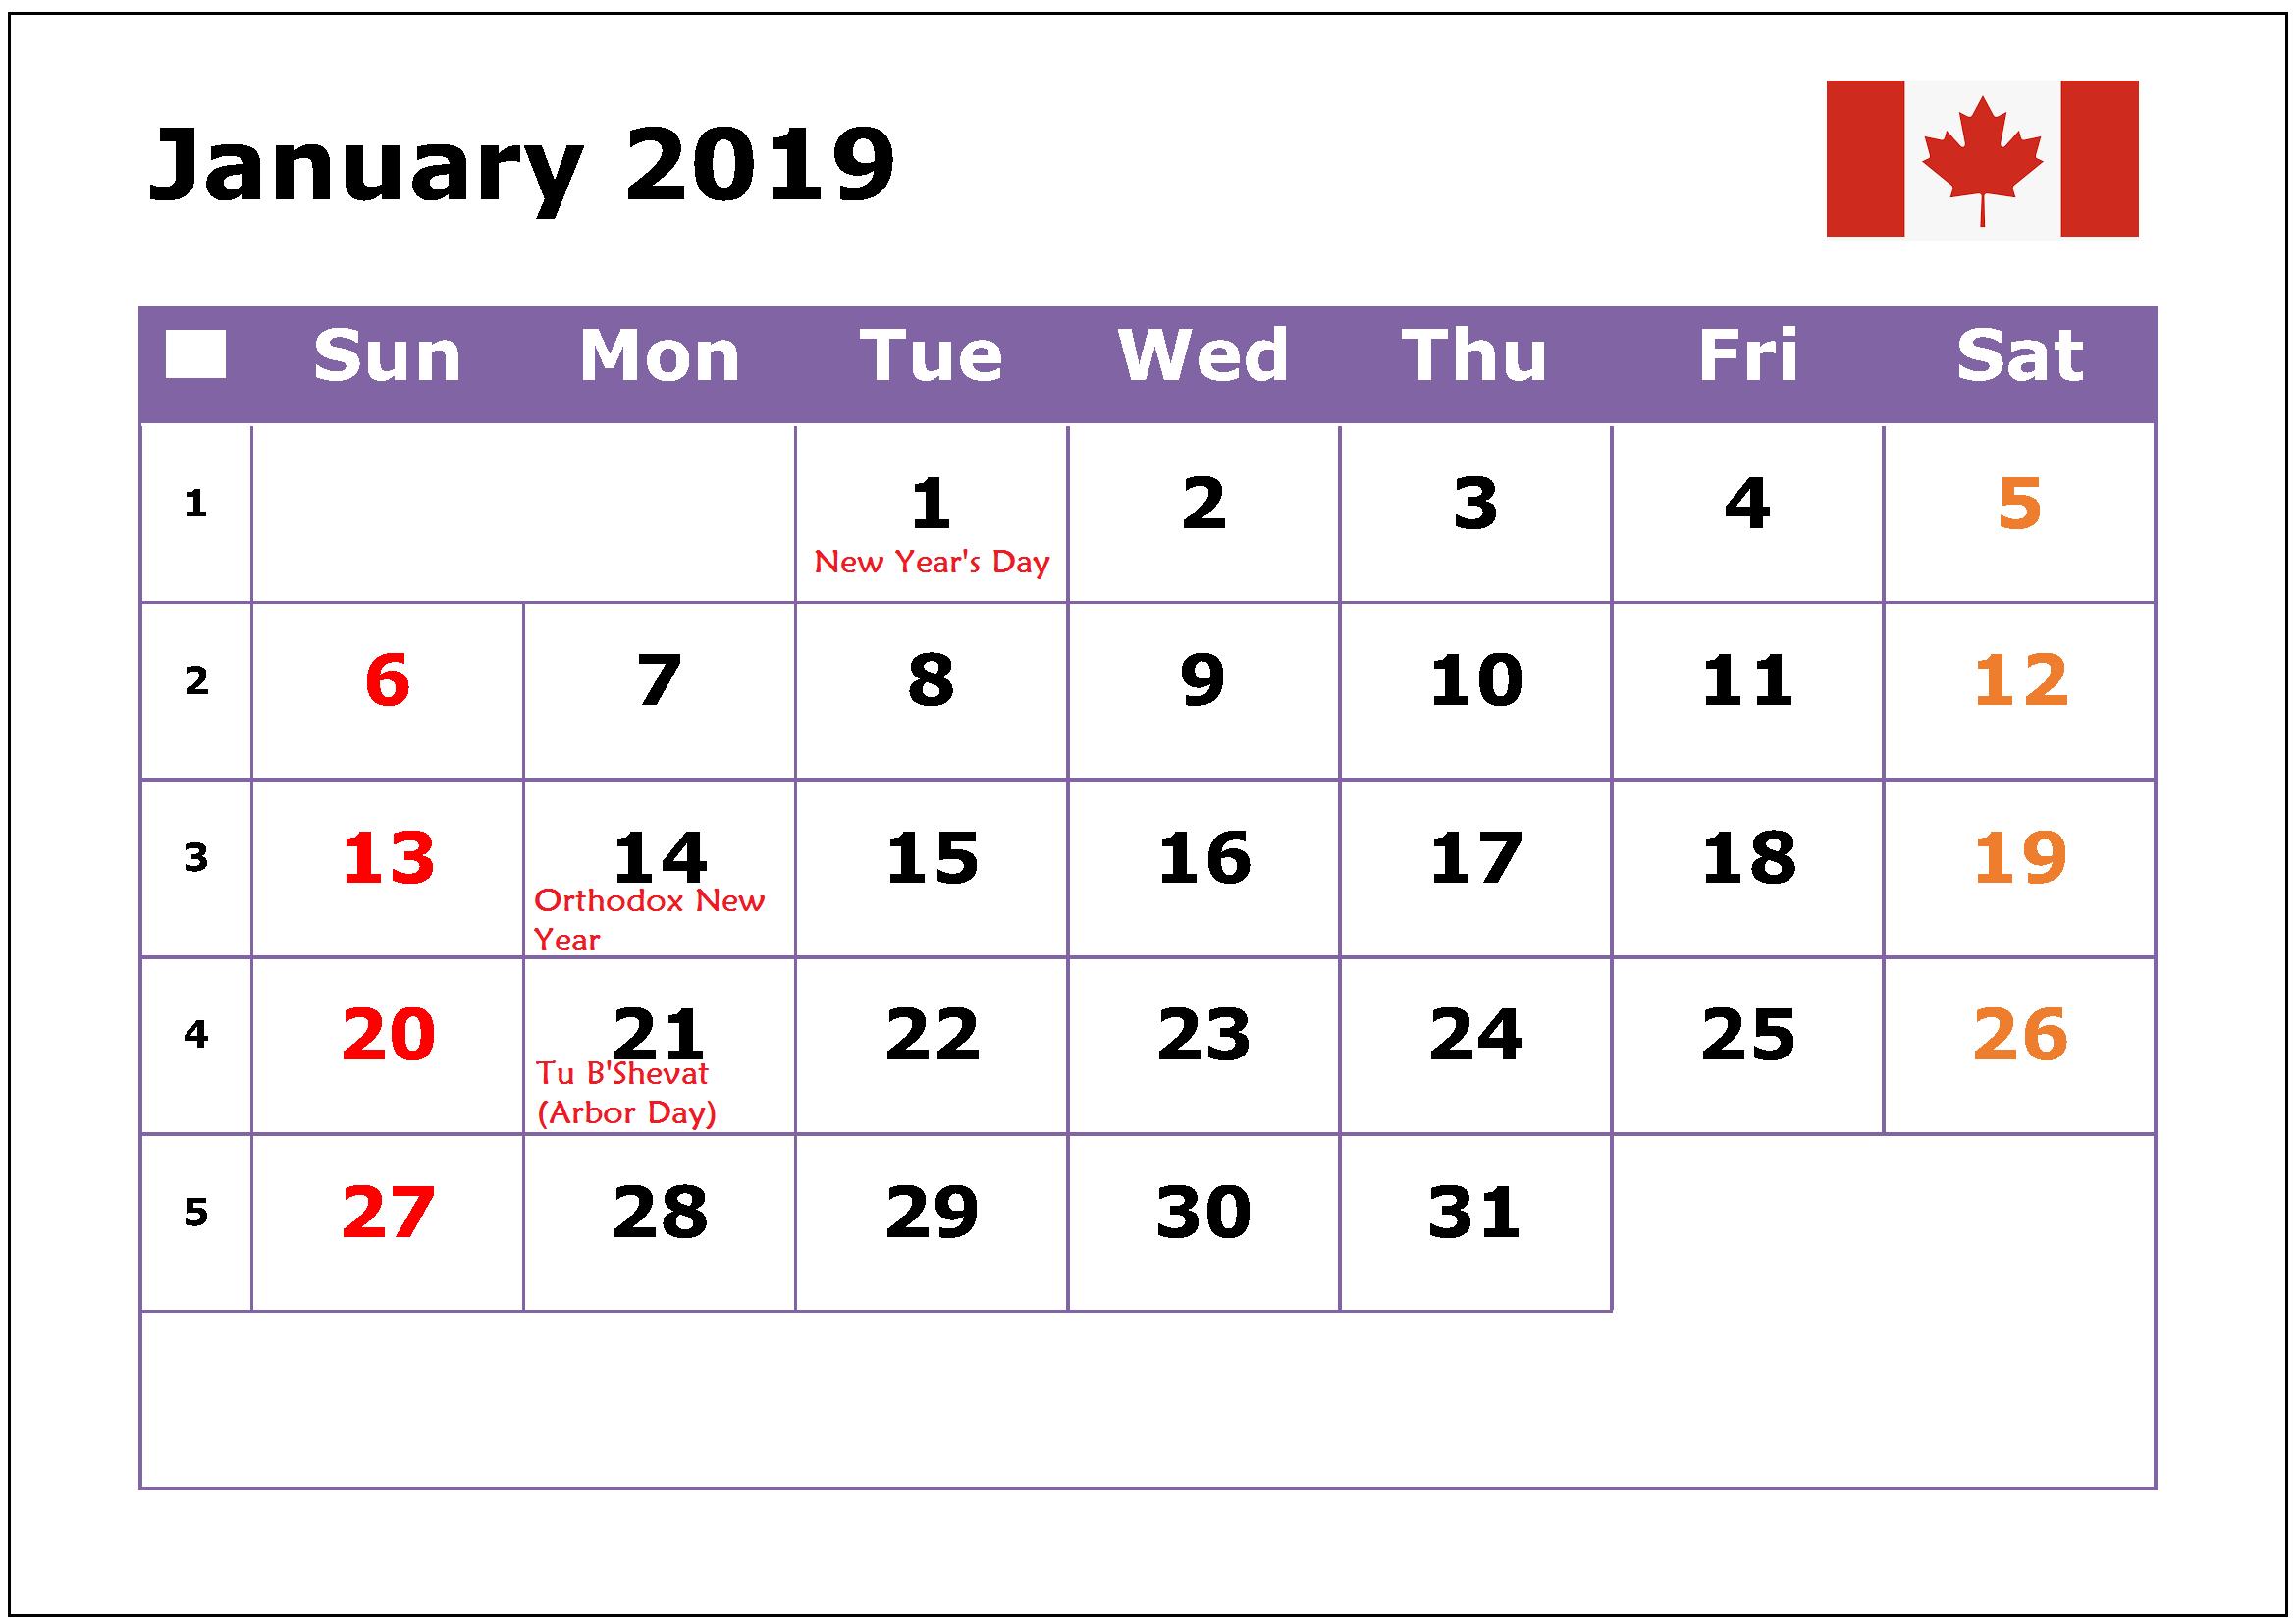 january 2019 public holidays